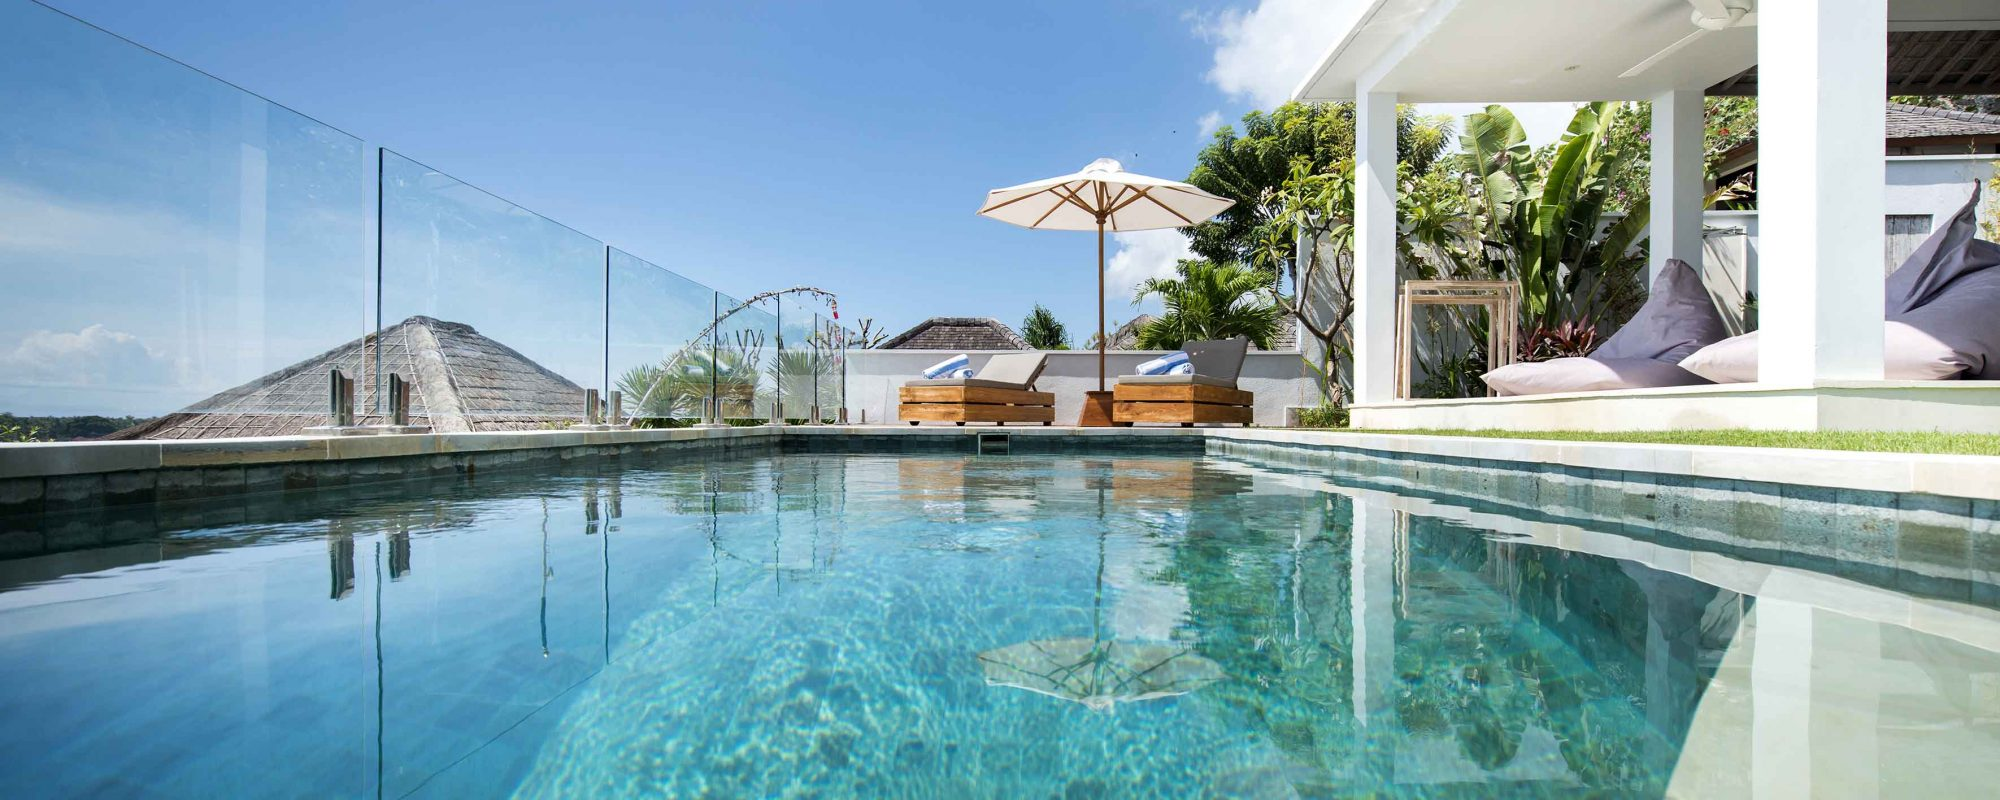 Pool Surf Camp Bali